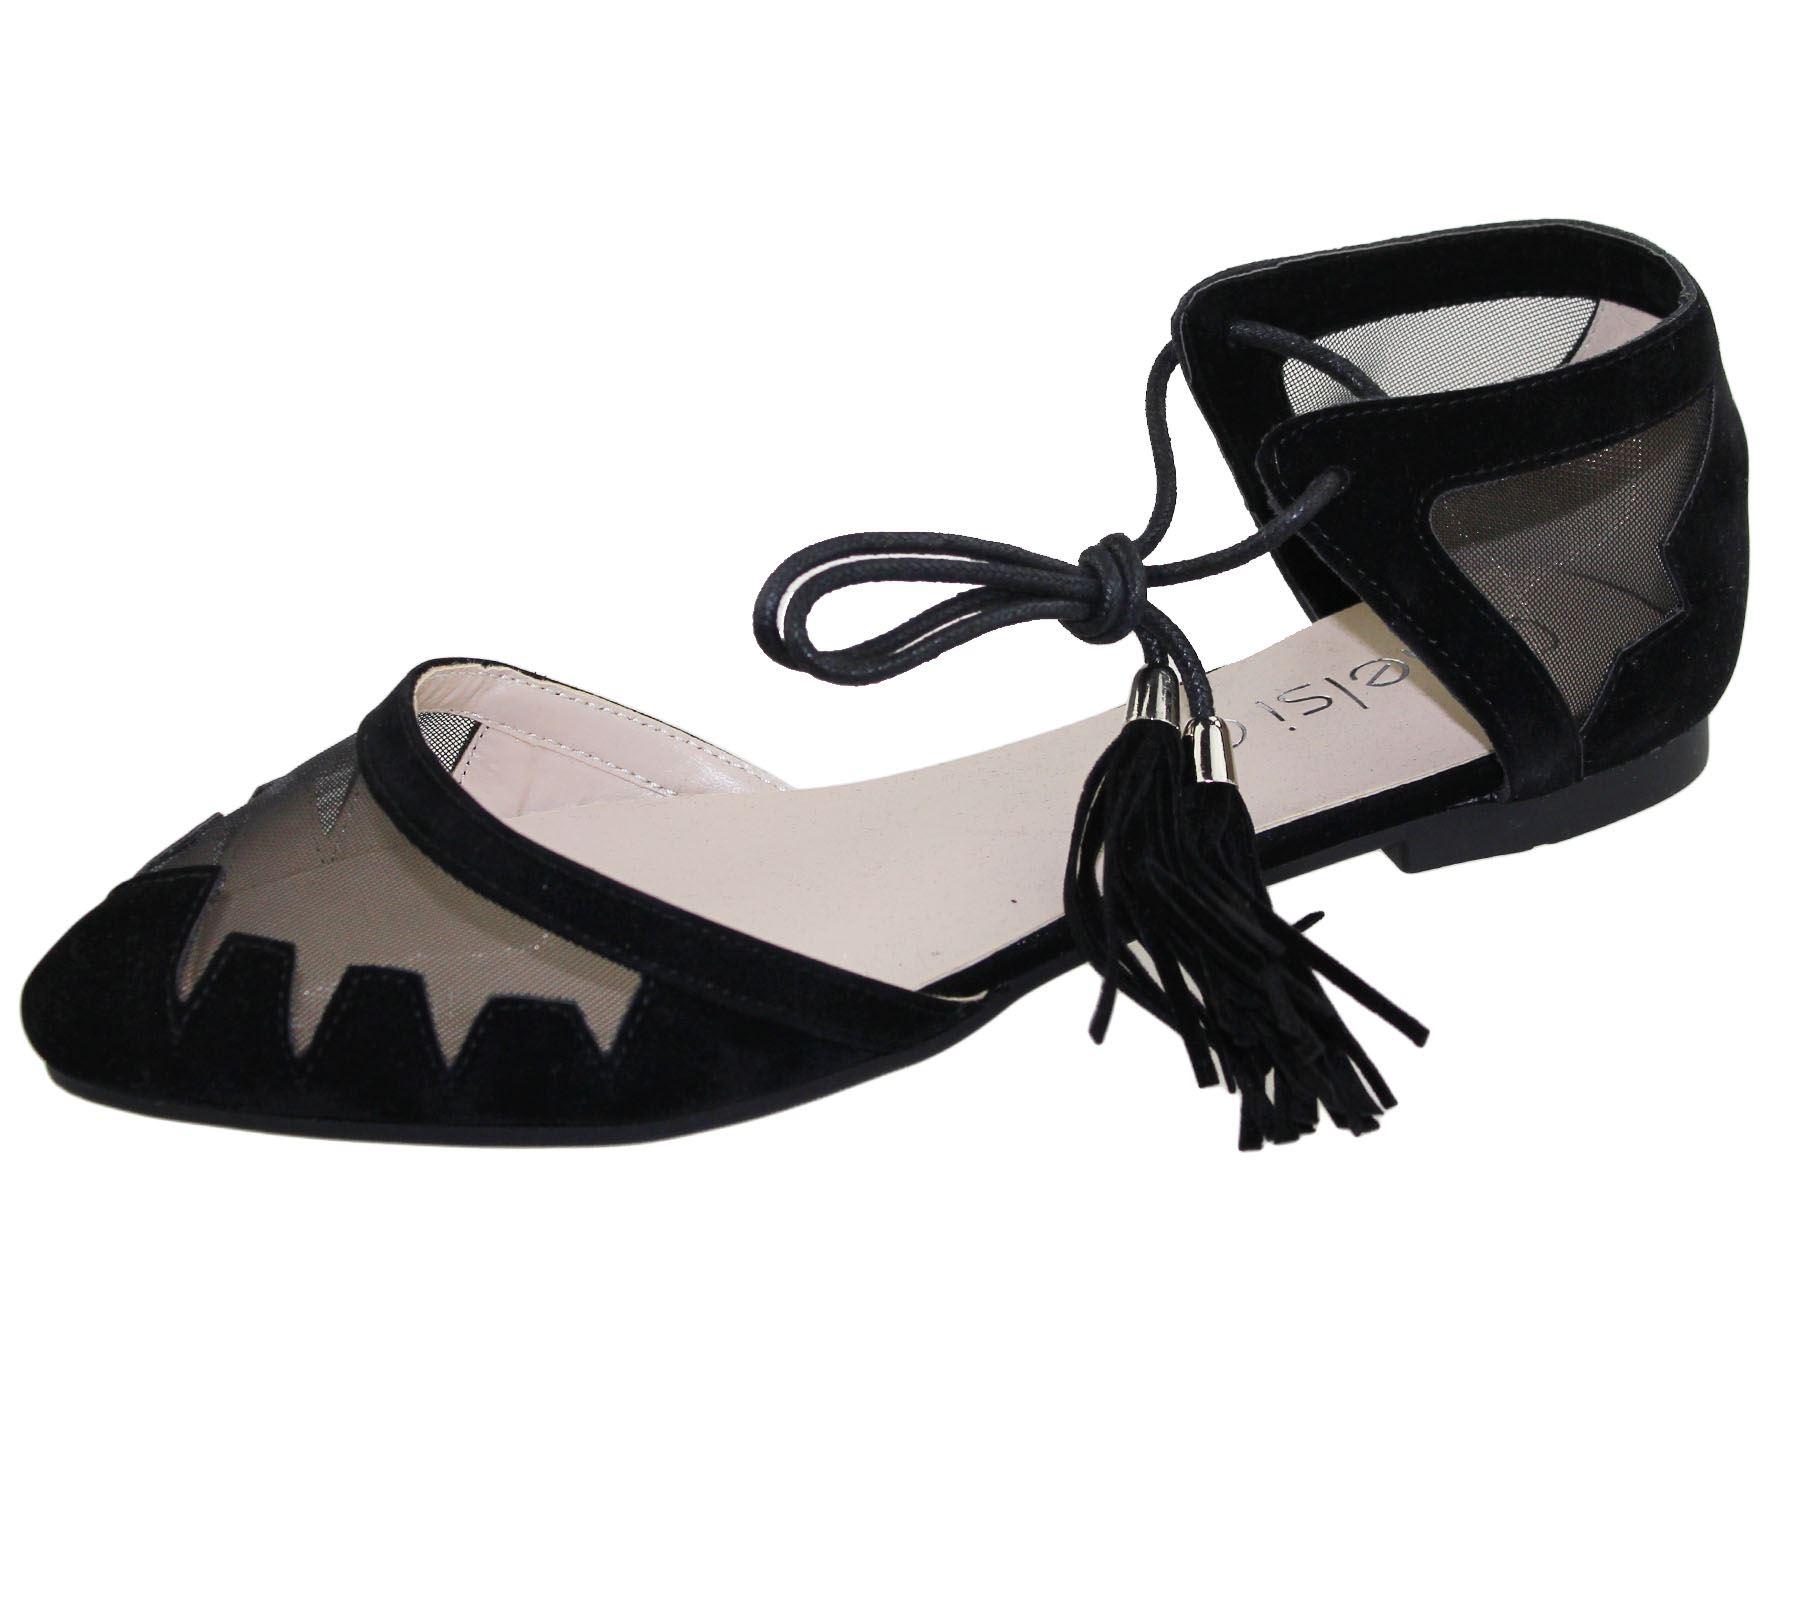 Womens-Flat-Ballerina-Dolly-Pumps-Ballet-Ladies-Summer-Mesh-Tassel-Shoes-Sandals thumbnail 36